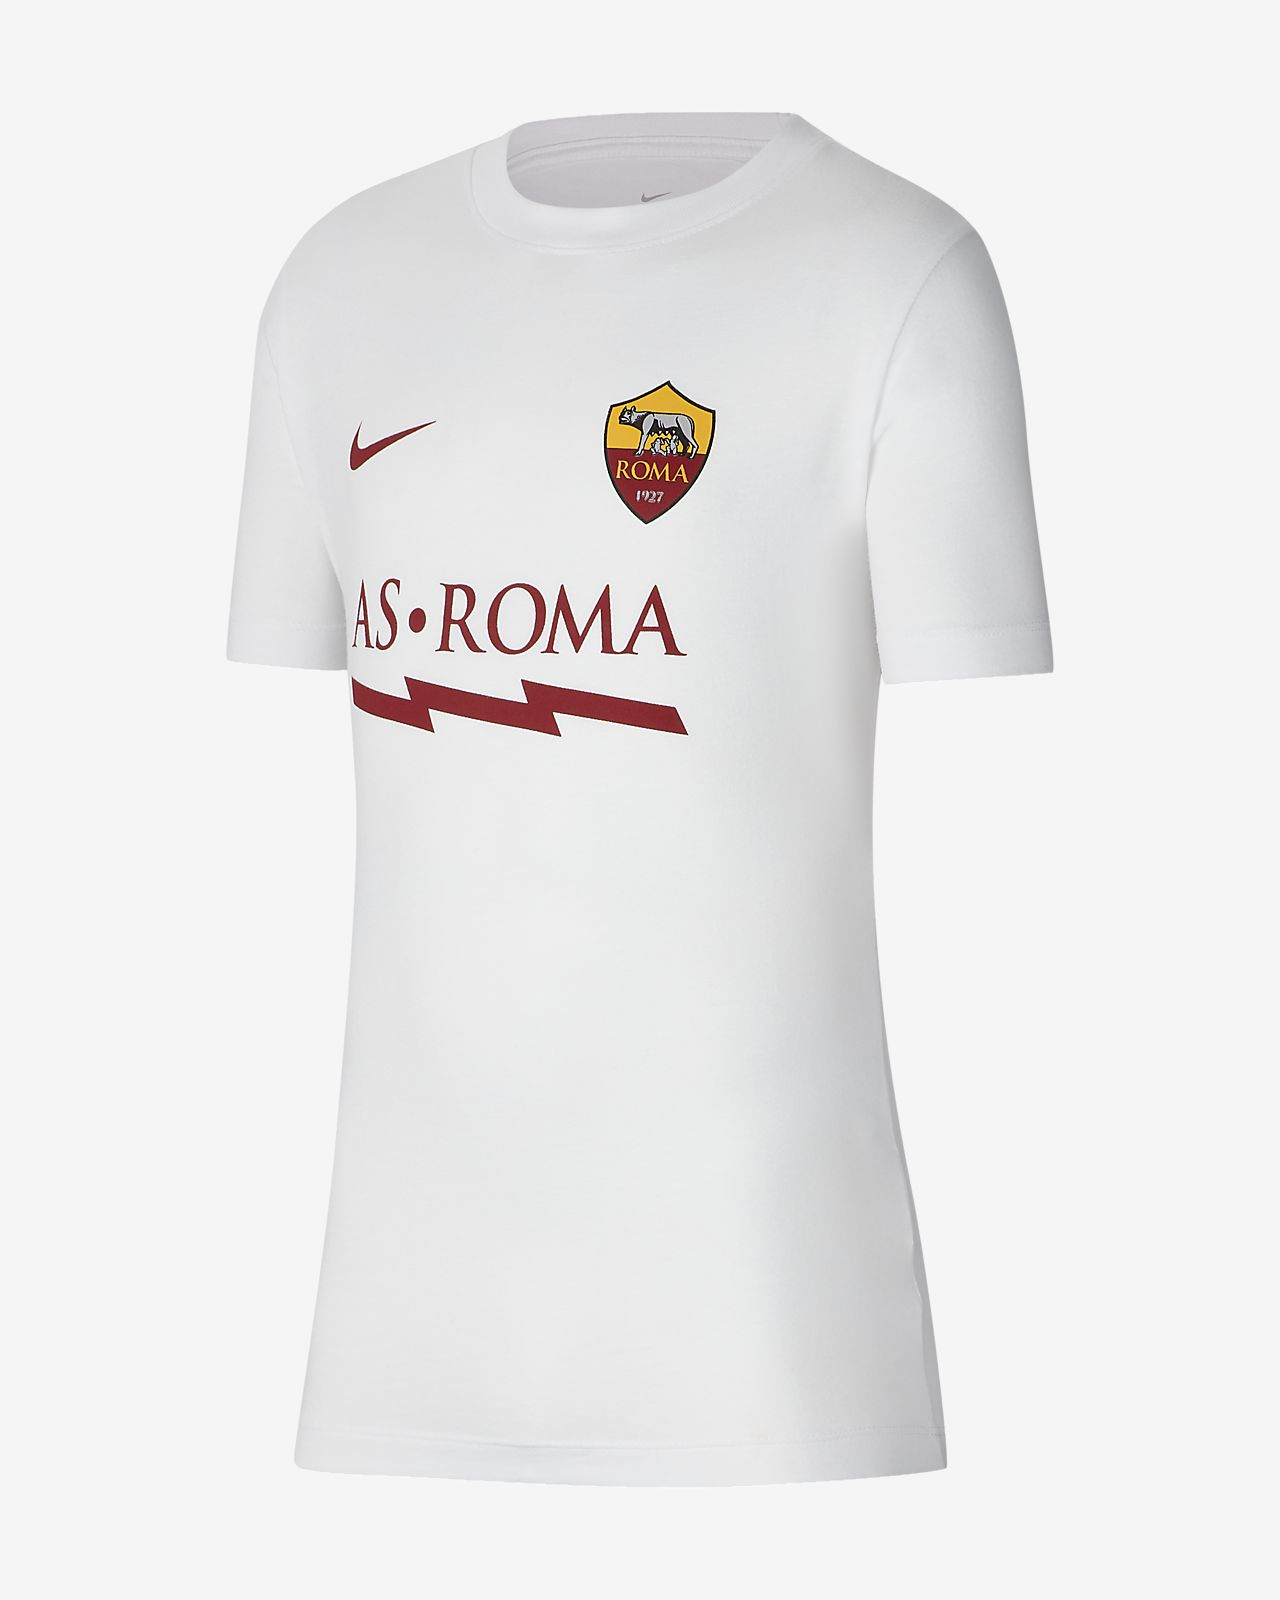 A.S. Roma Voetbalshirt voor kids